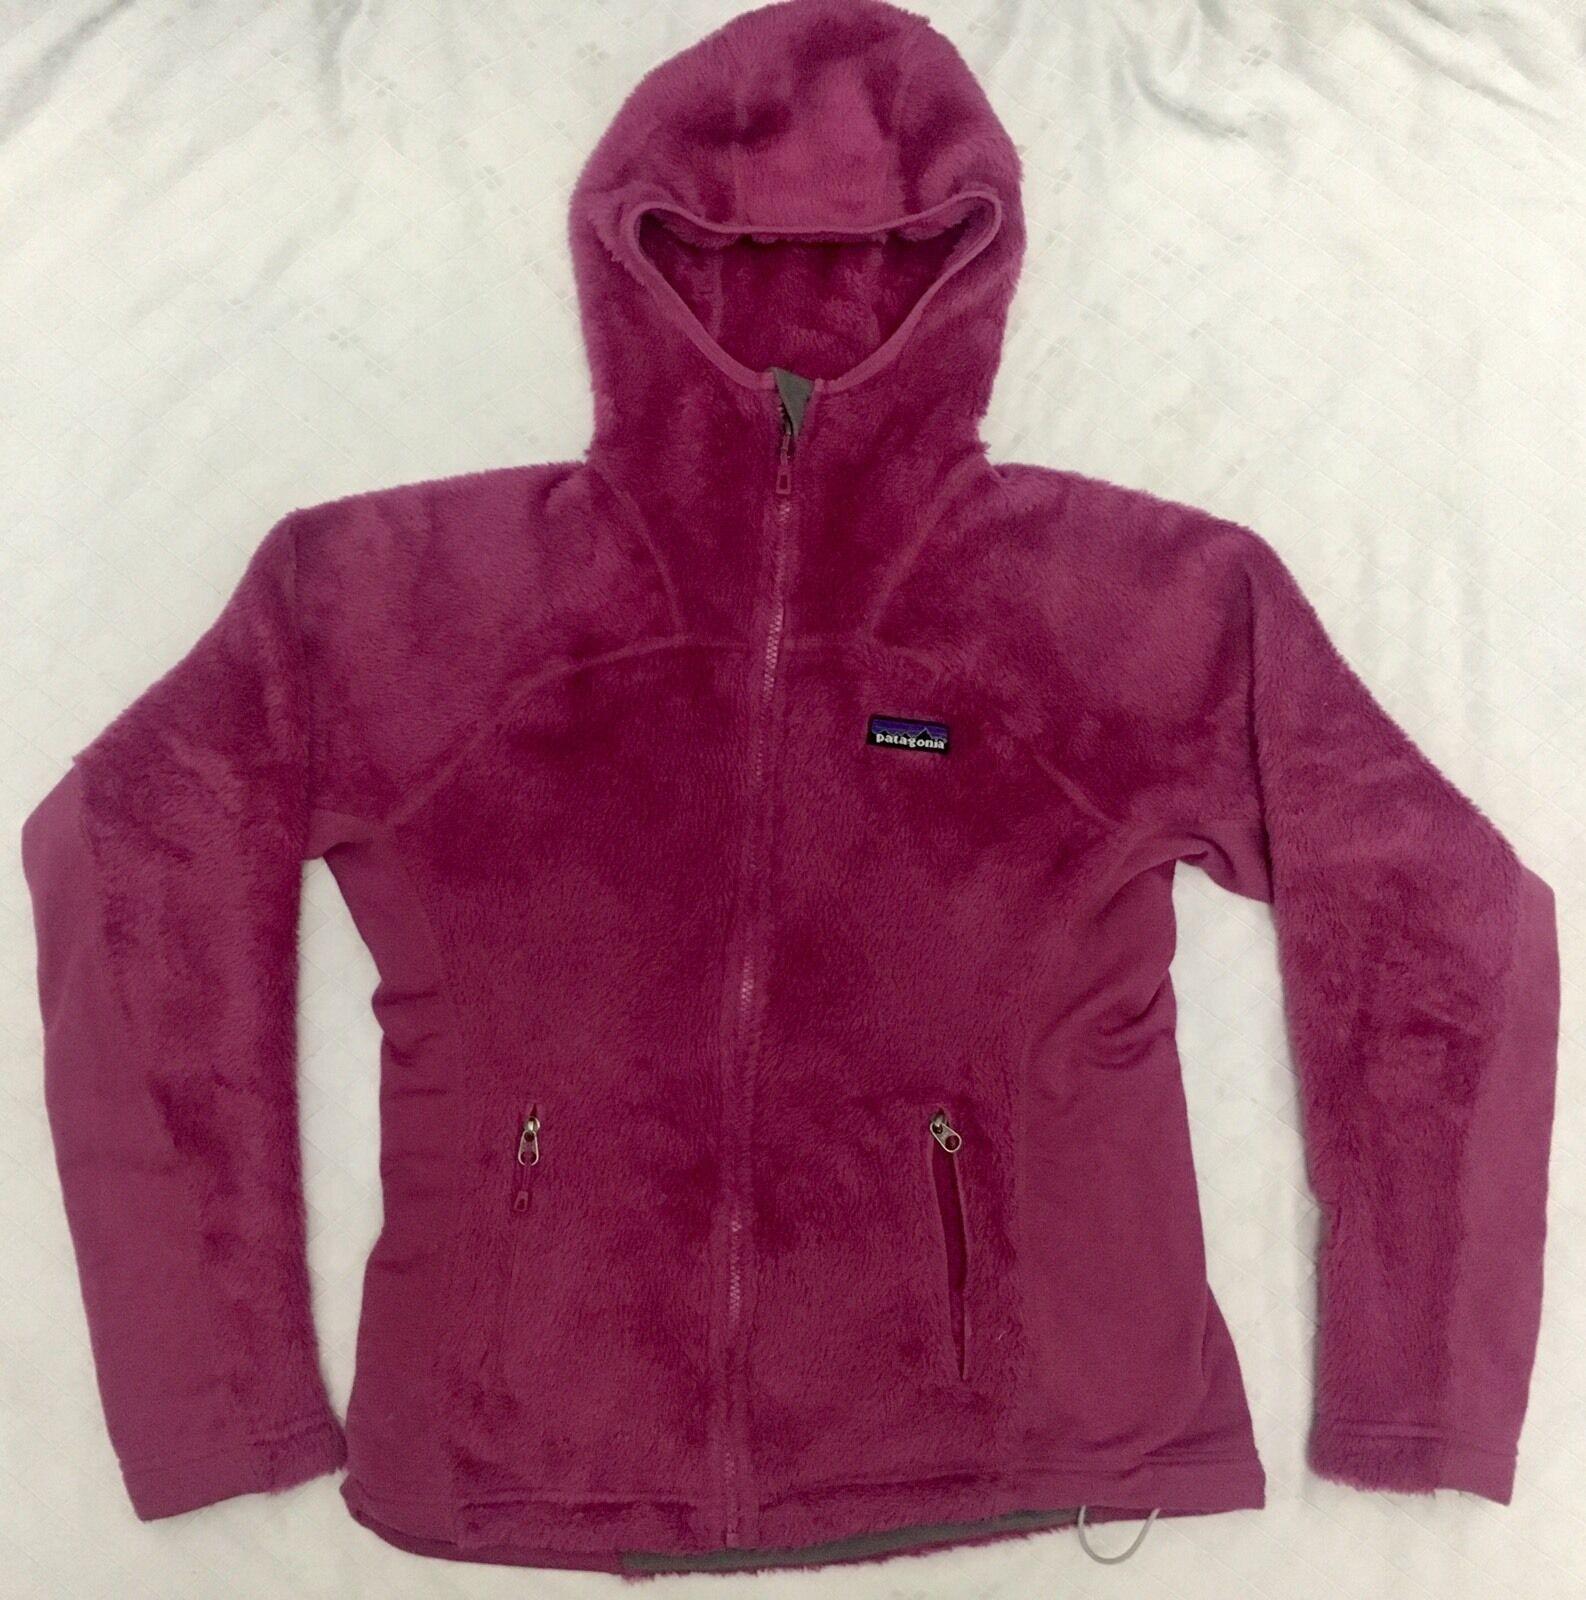 WOMENS Patagonia POLARTEC R Full Zip Zip Zip ULTRA PLUSH Fleece hoodie Size SMALL 666503